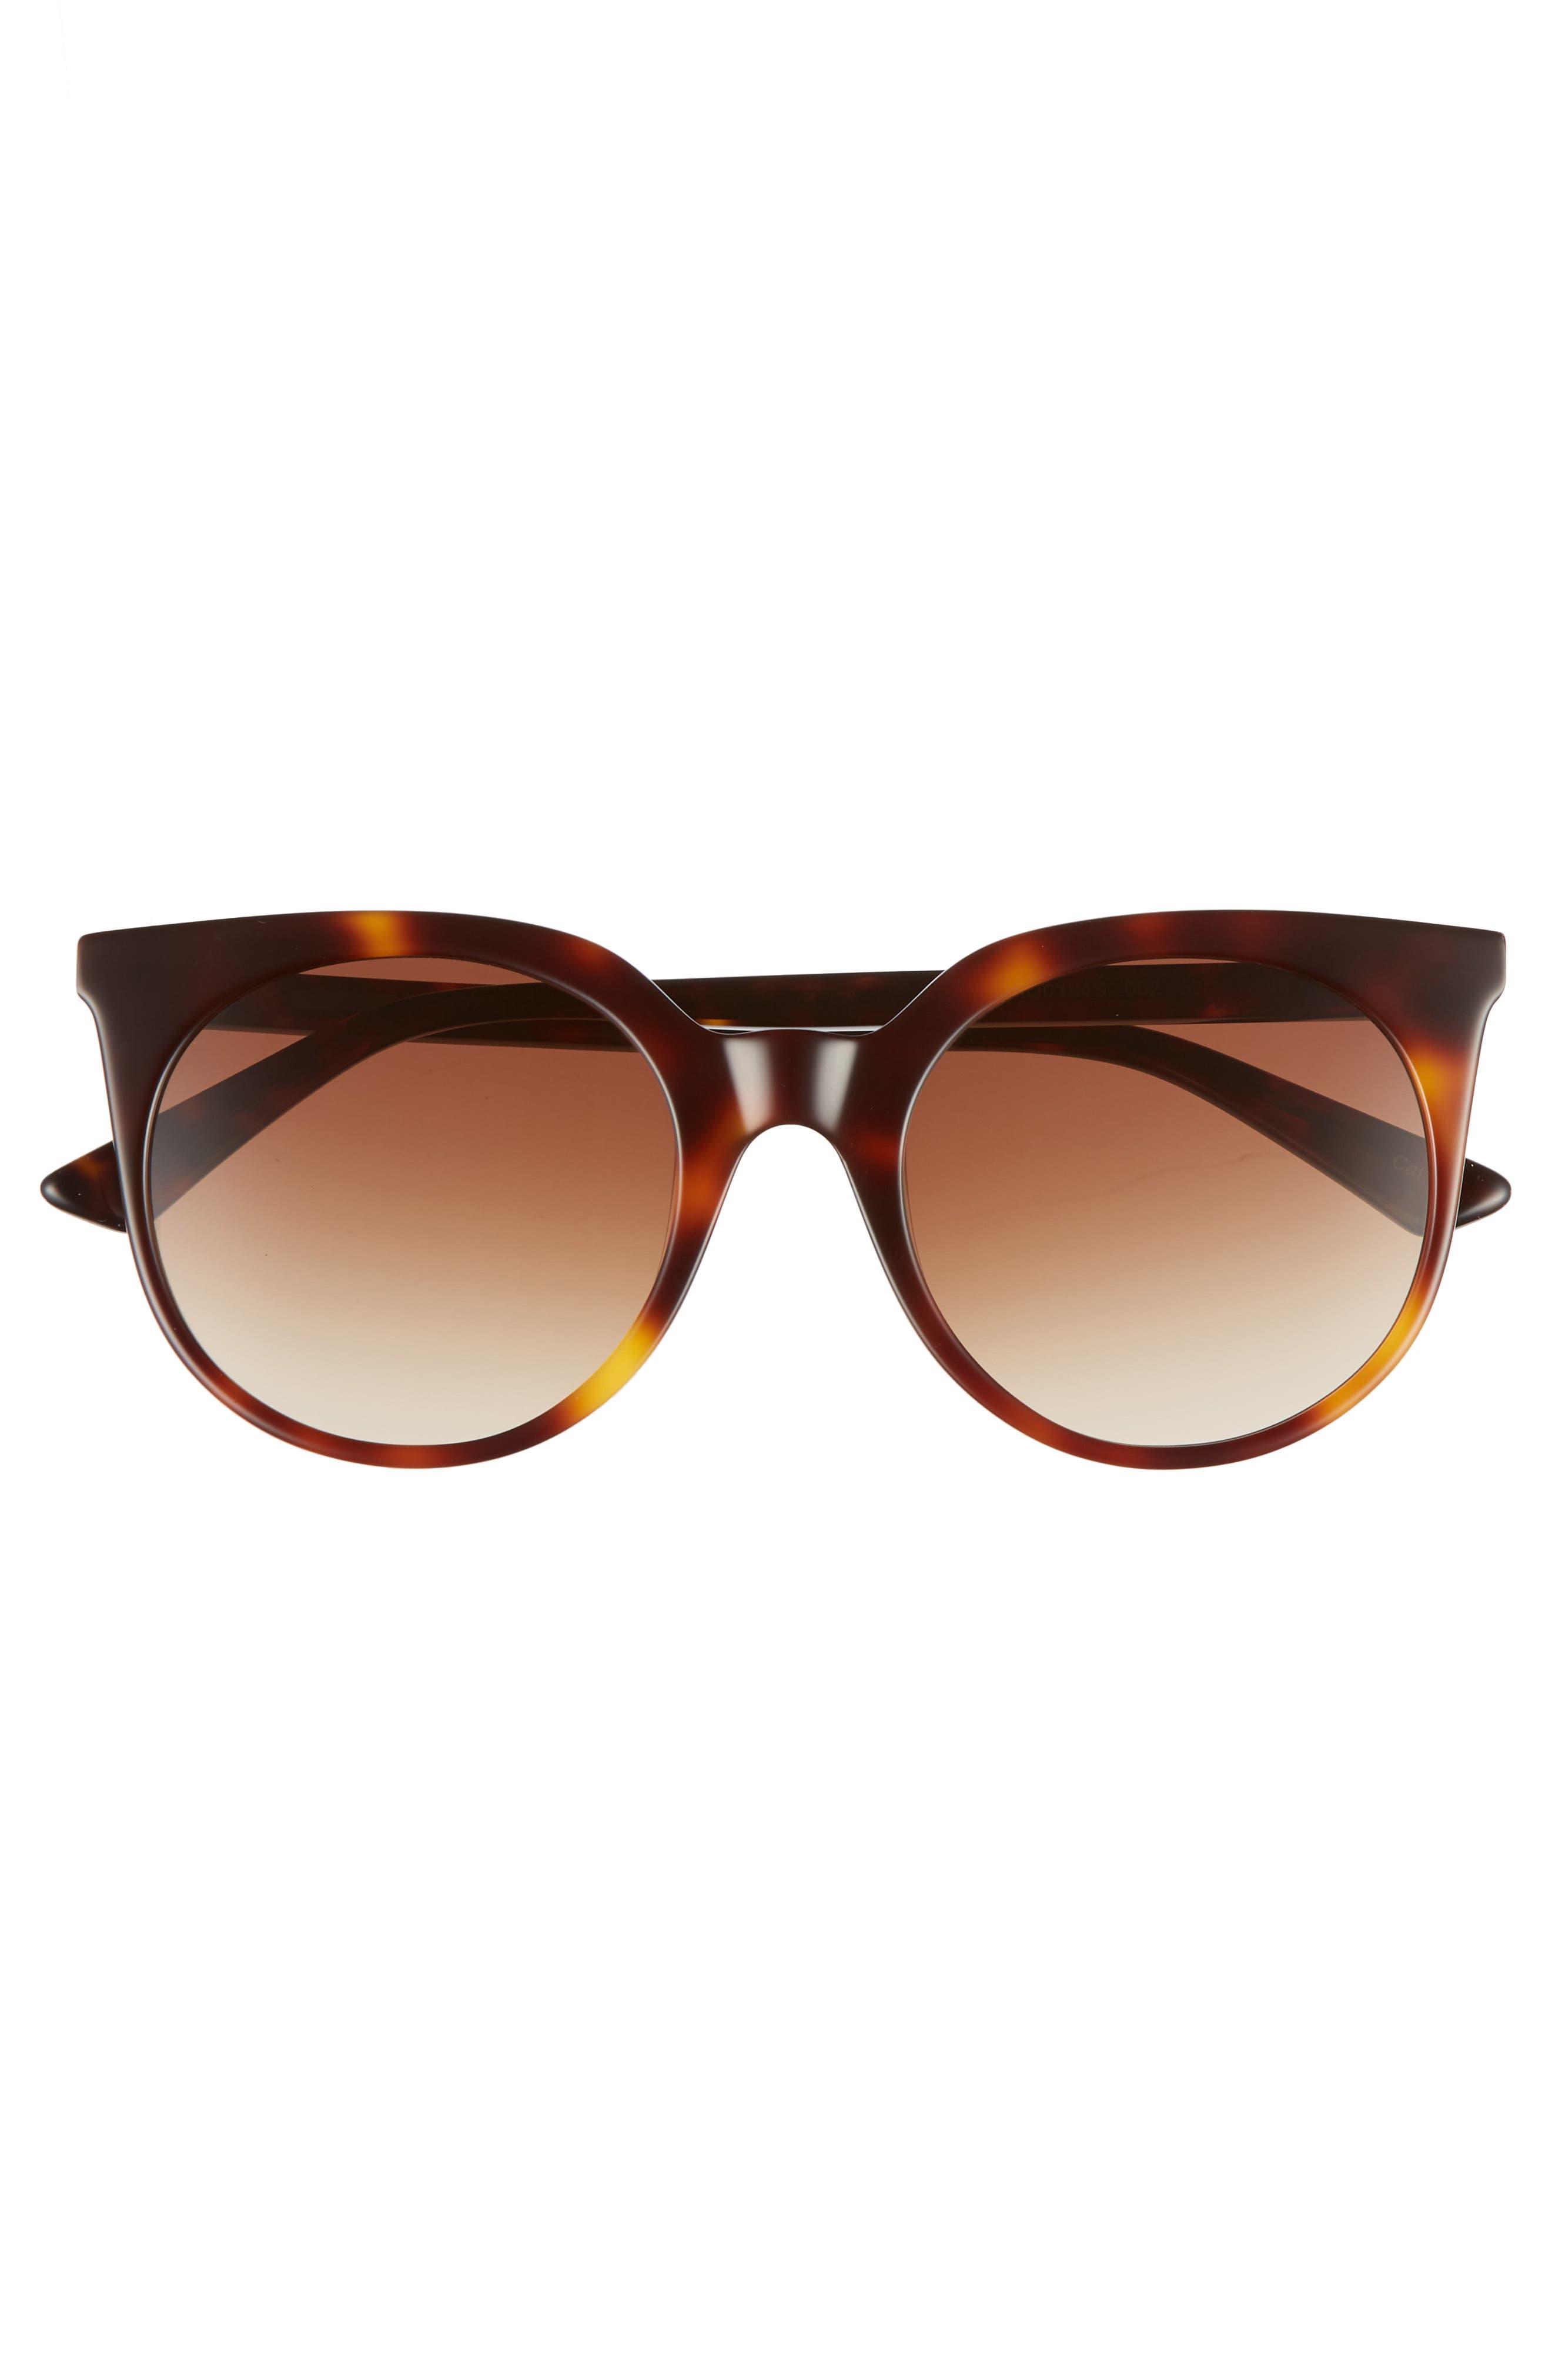 MCQ ALEXANDER MCQUEEN, 52mm Cat Eye Sunglasses, Alternate thumbnail 3, color, HAVANA